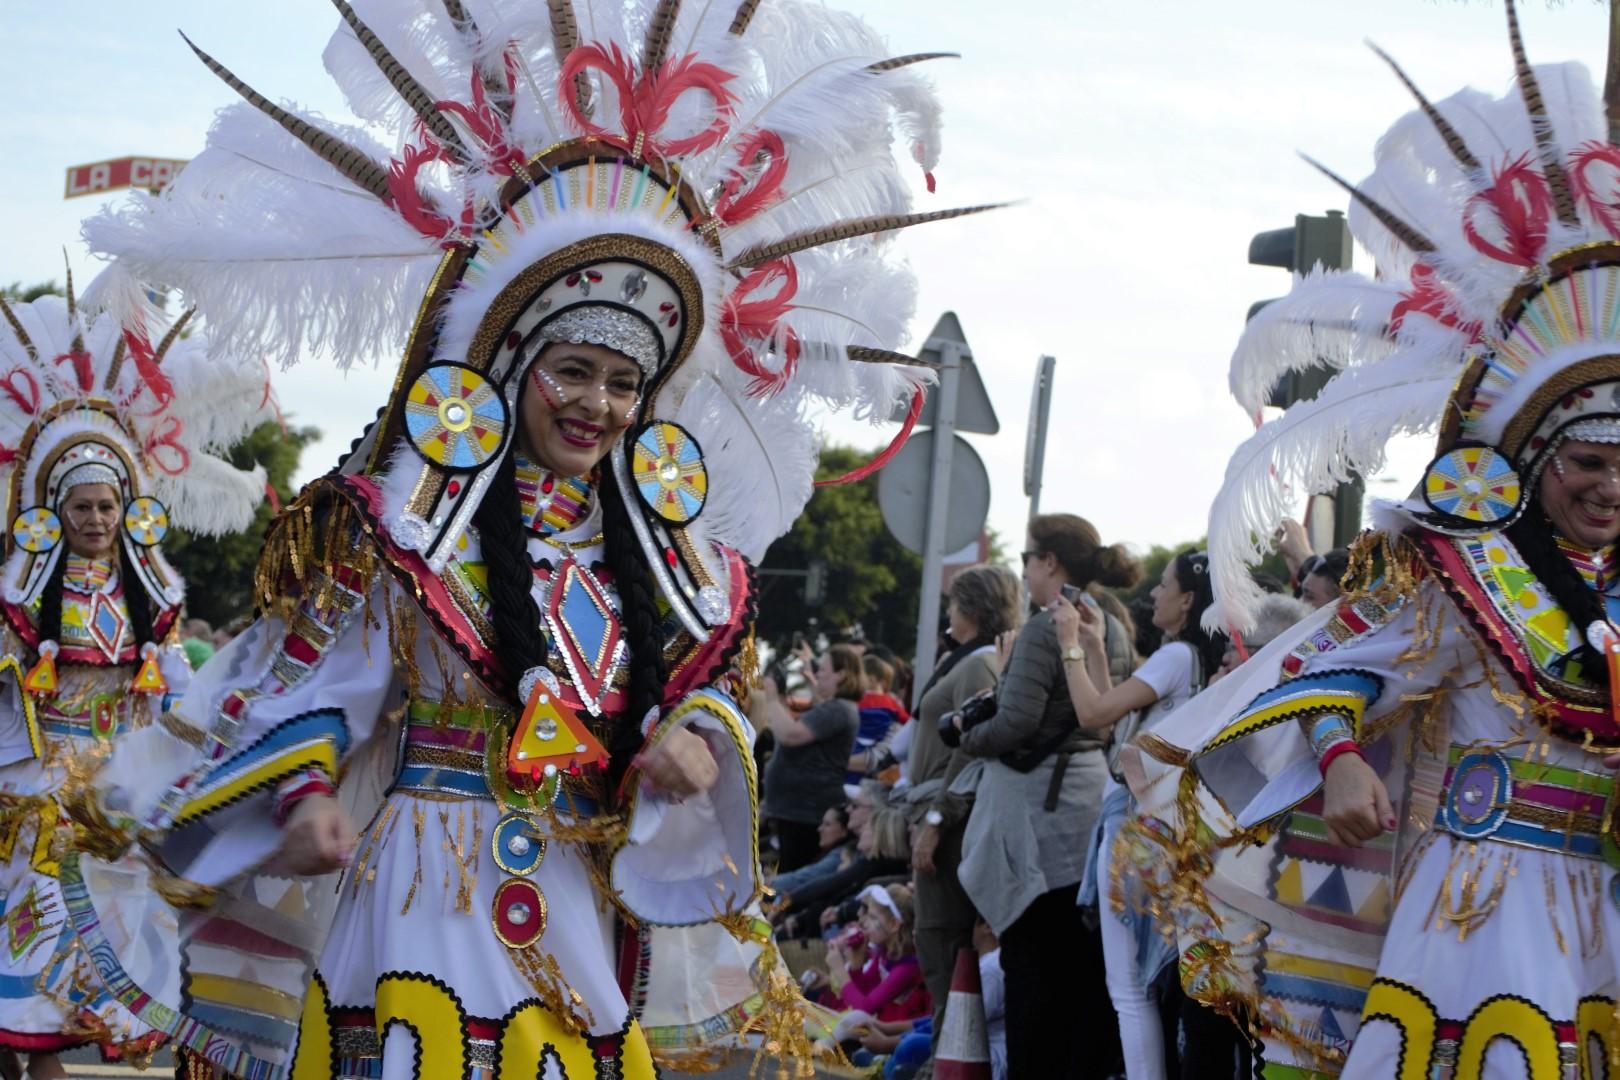 Coso Apoteosis del Carnaval 2018